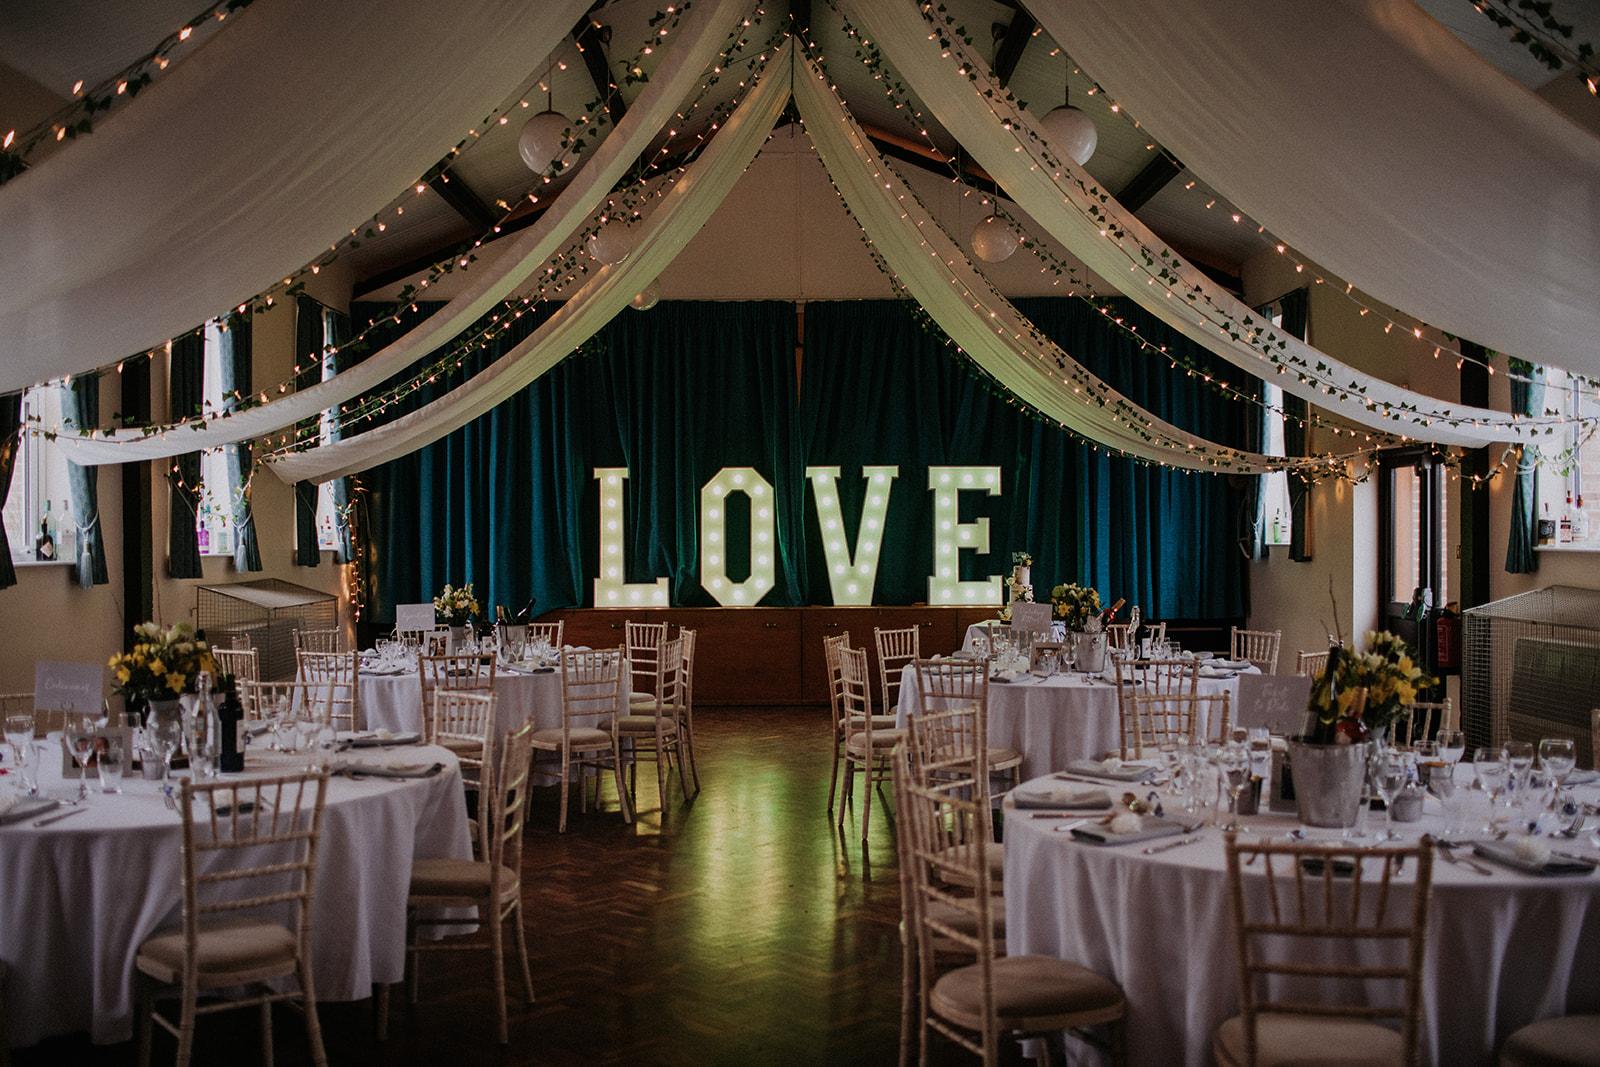 wedding decor inspiration - wedding love sign - rutland wedding - fun wedding - east midlands wedding planner - Leicestershire wedding planning - nottingham wedding planning